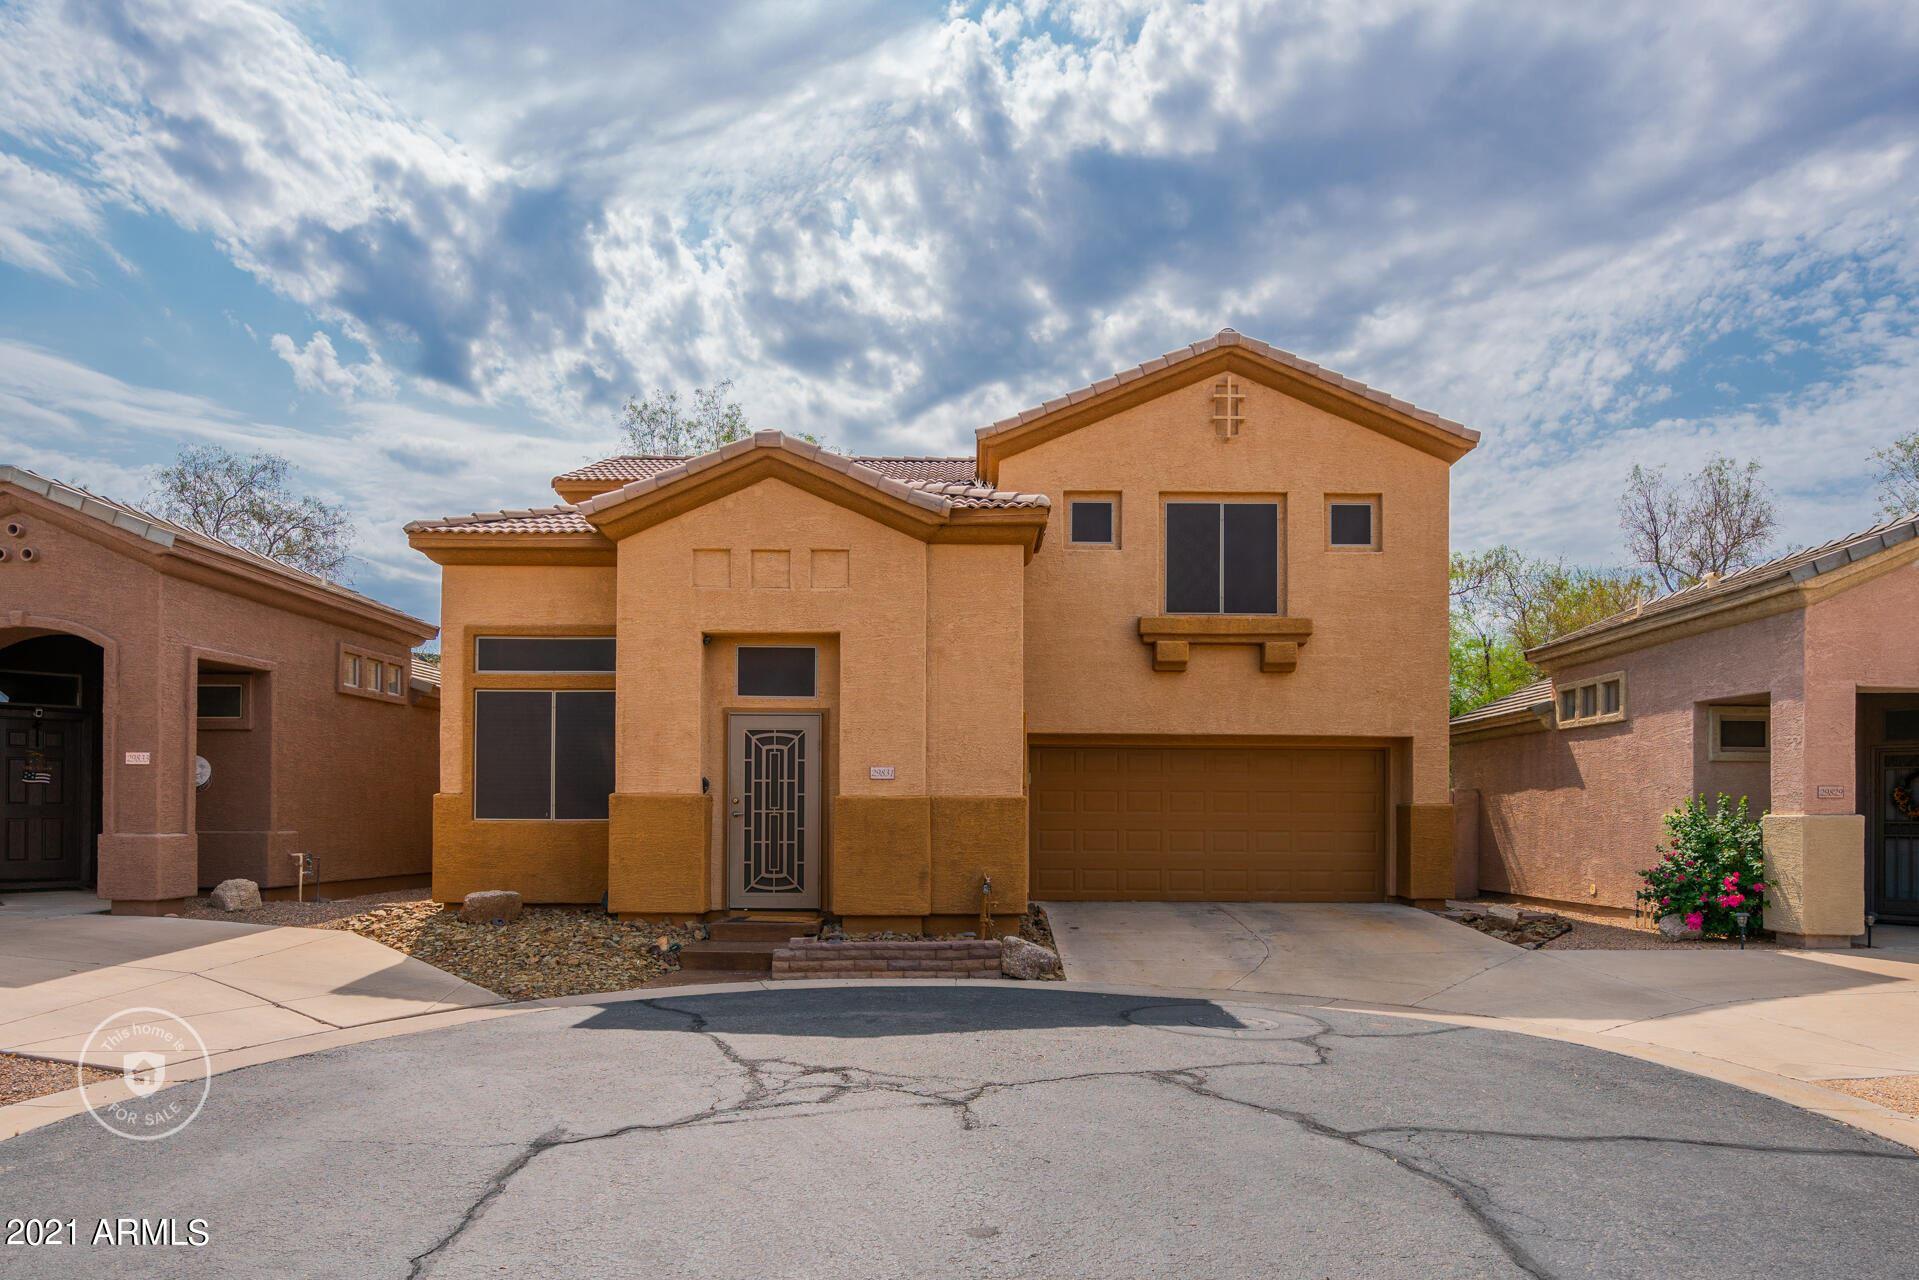 29831 N 41ST Place, Cave Creek, AZ 85331 - MLS#: 6272786